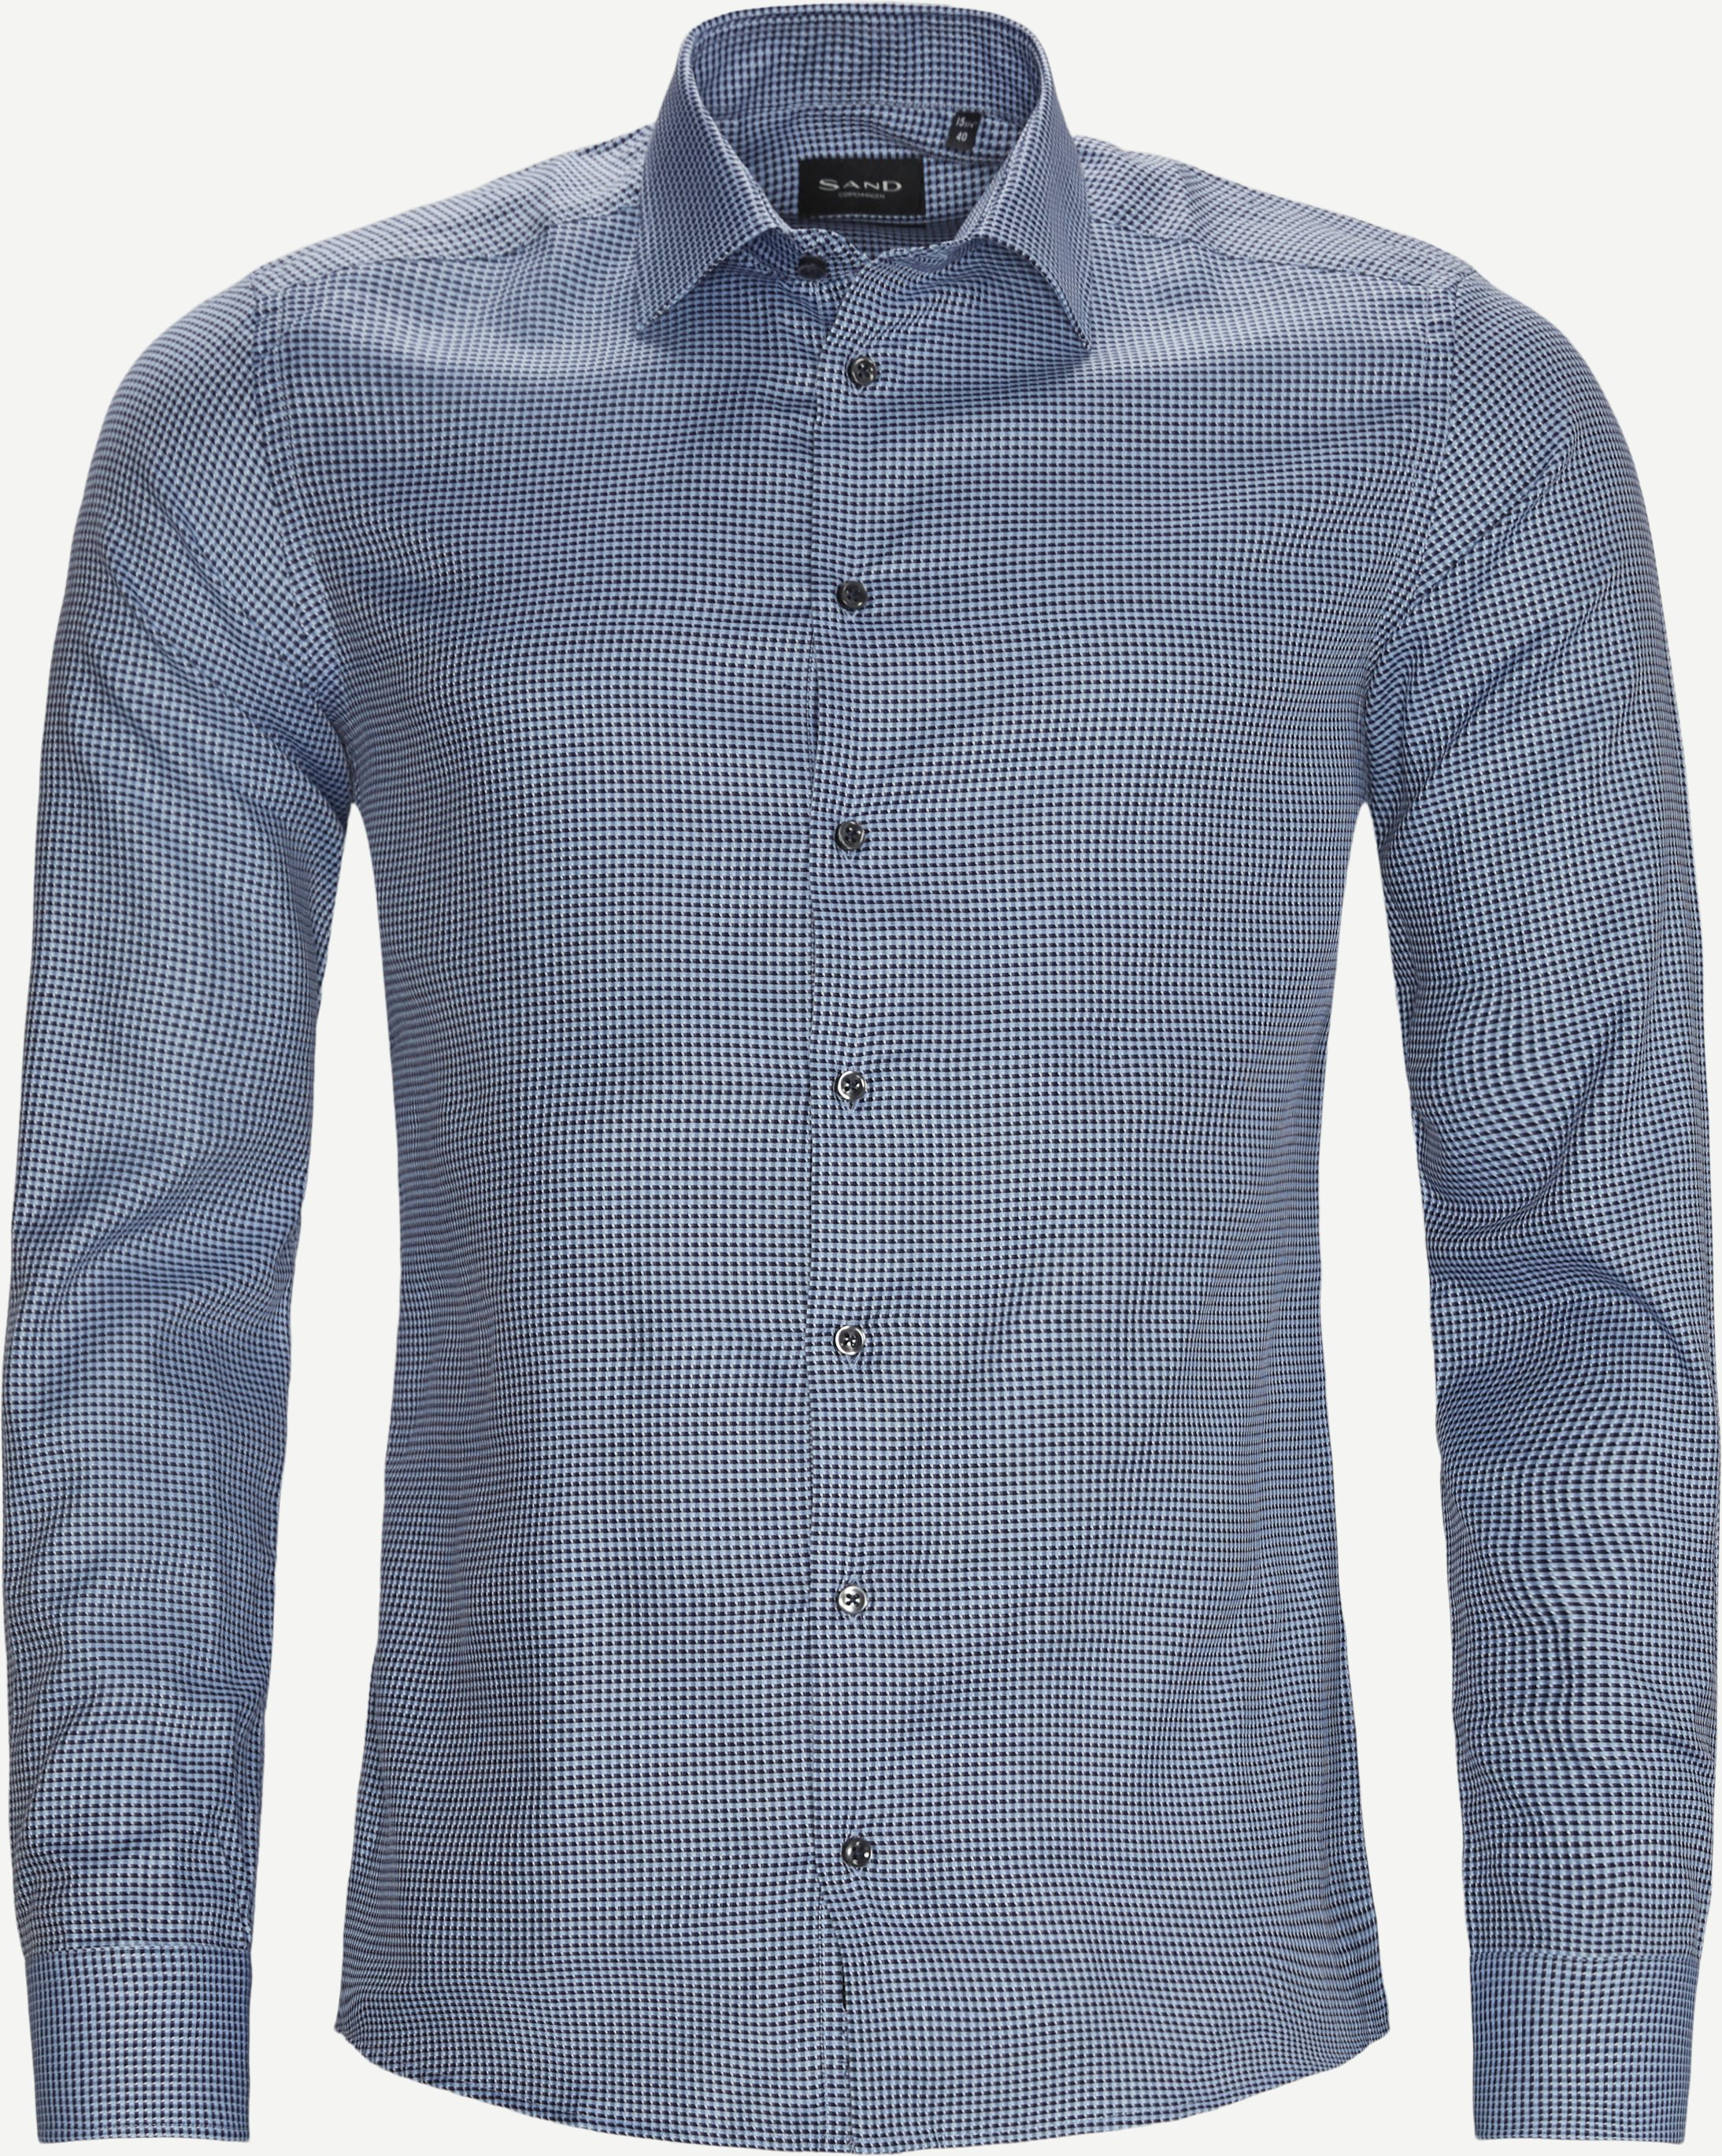 8650 Iver 2/State N 2 Shirt - Skjorter - Blå